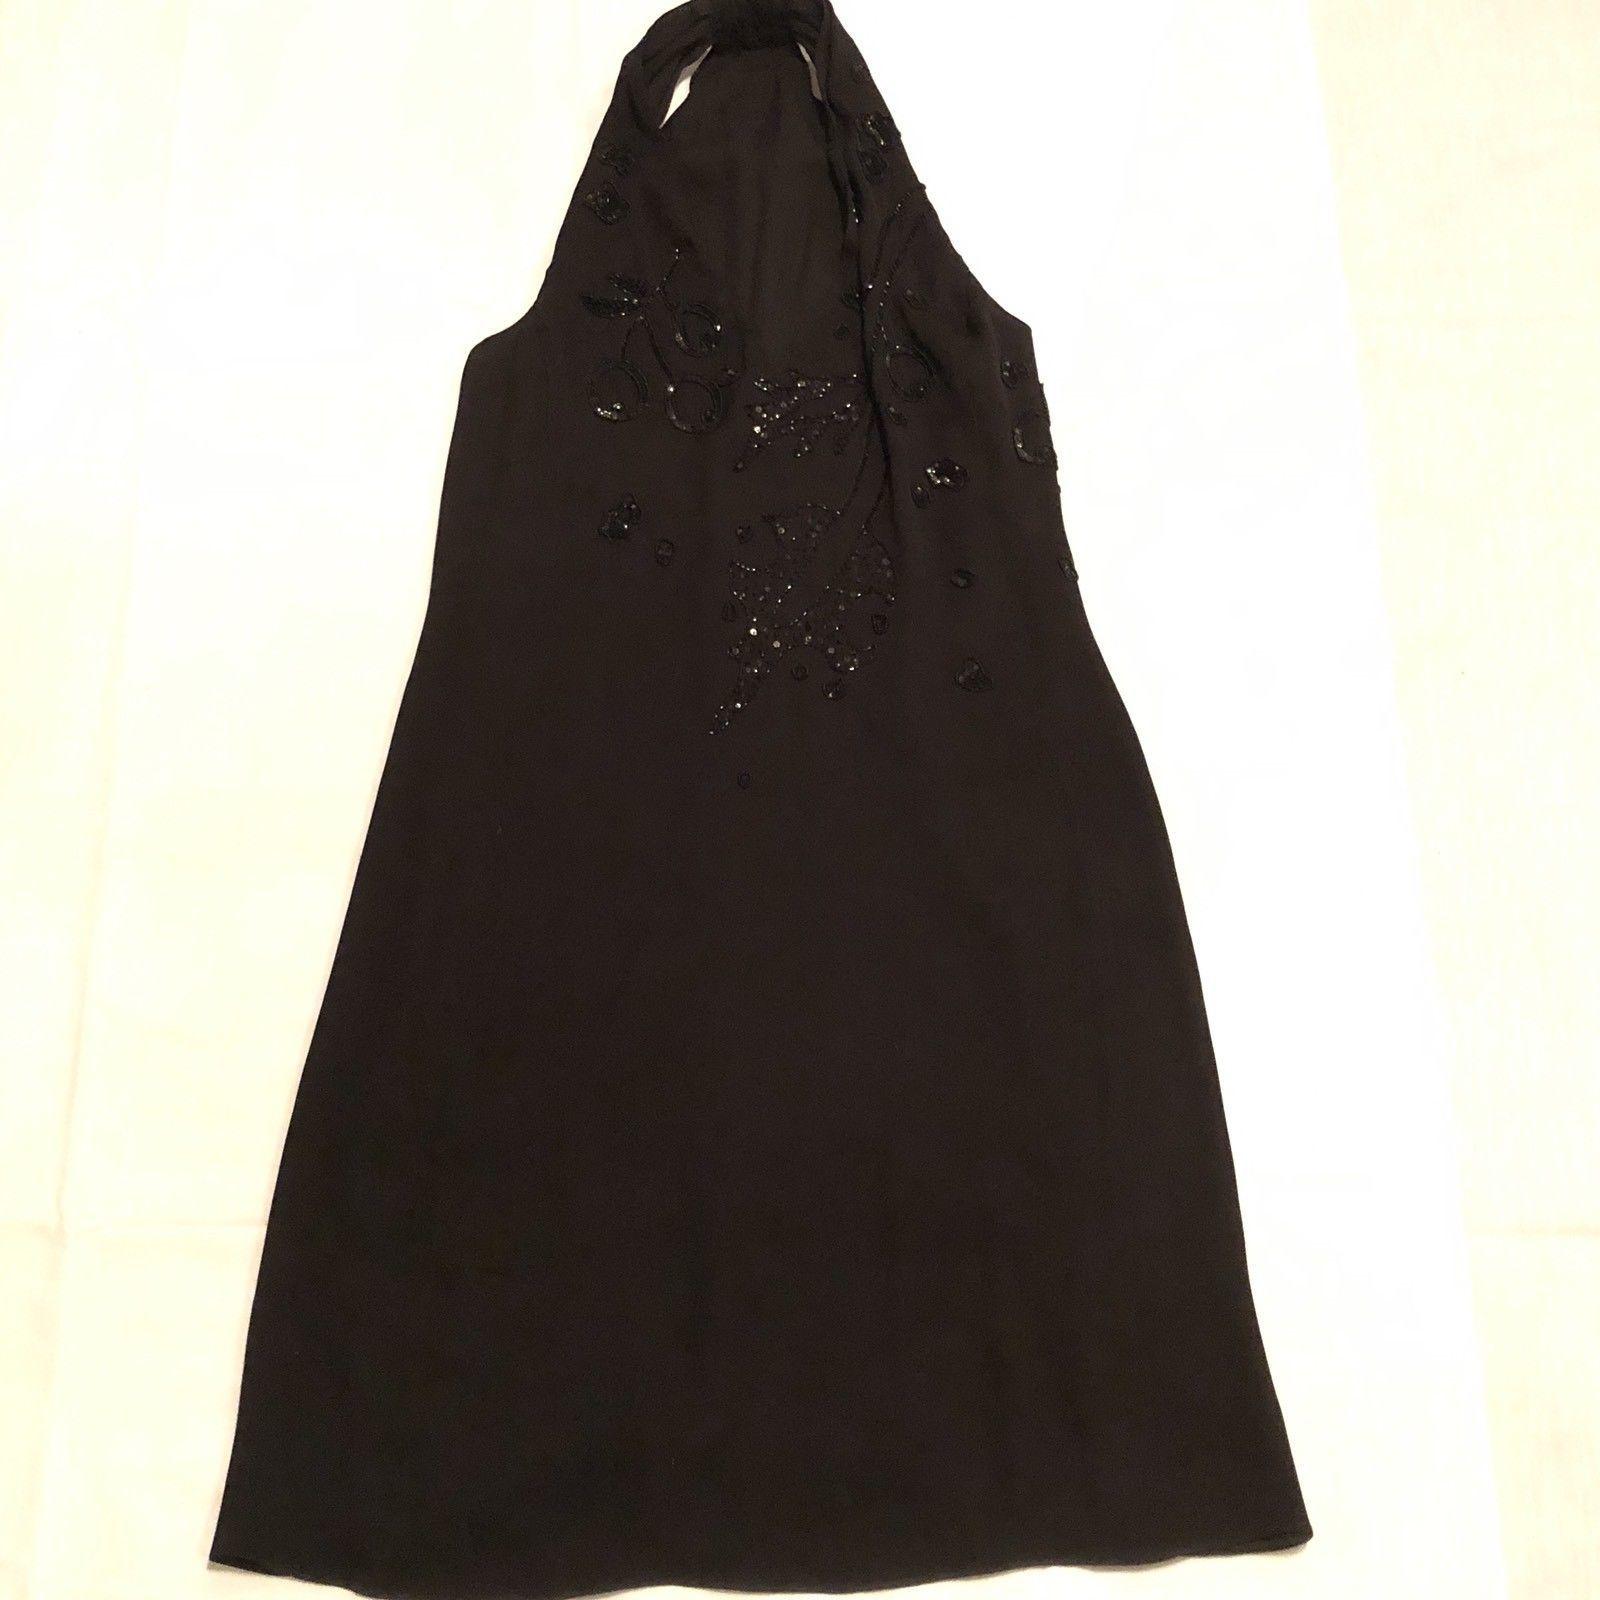 Armani Collezioni Black Halter Lined Dress Size 10 EU 46 Prom Evening image 7